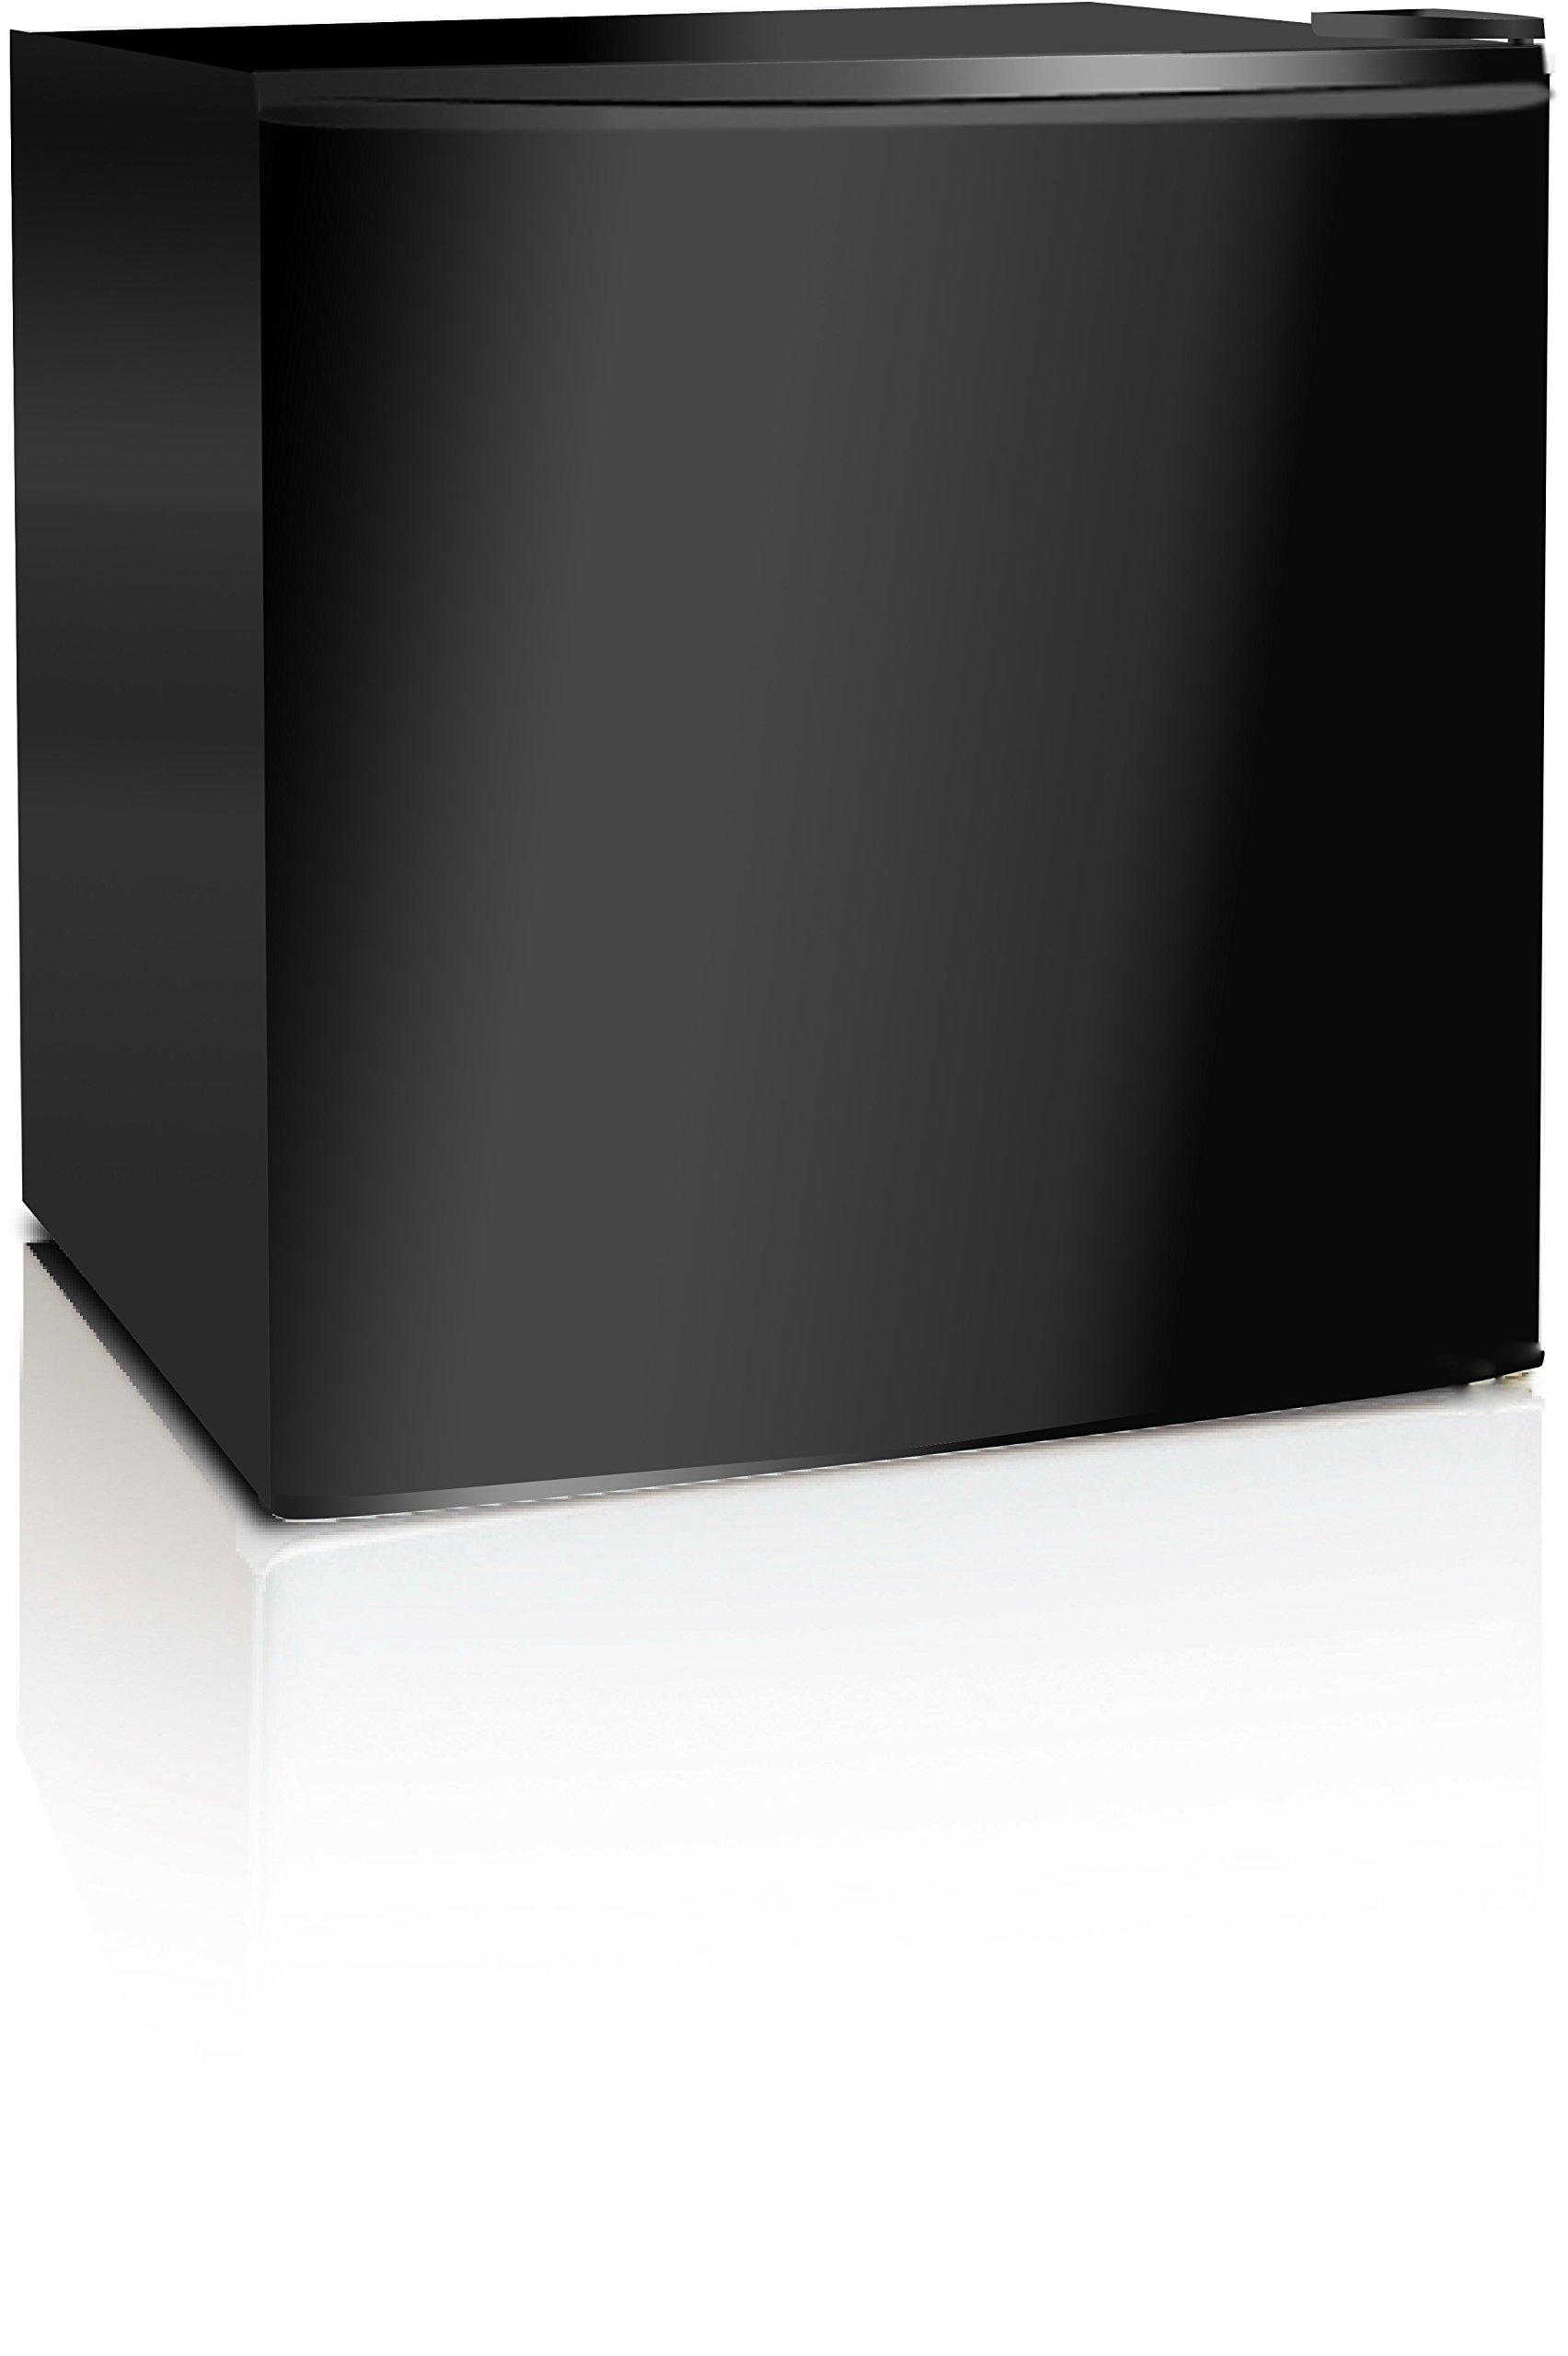 Midea WHS-65LB1 Compact Single Reversible Door Refrigerator, 1.6 Cubic Feet(0.045 Cubic Meter), Black